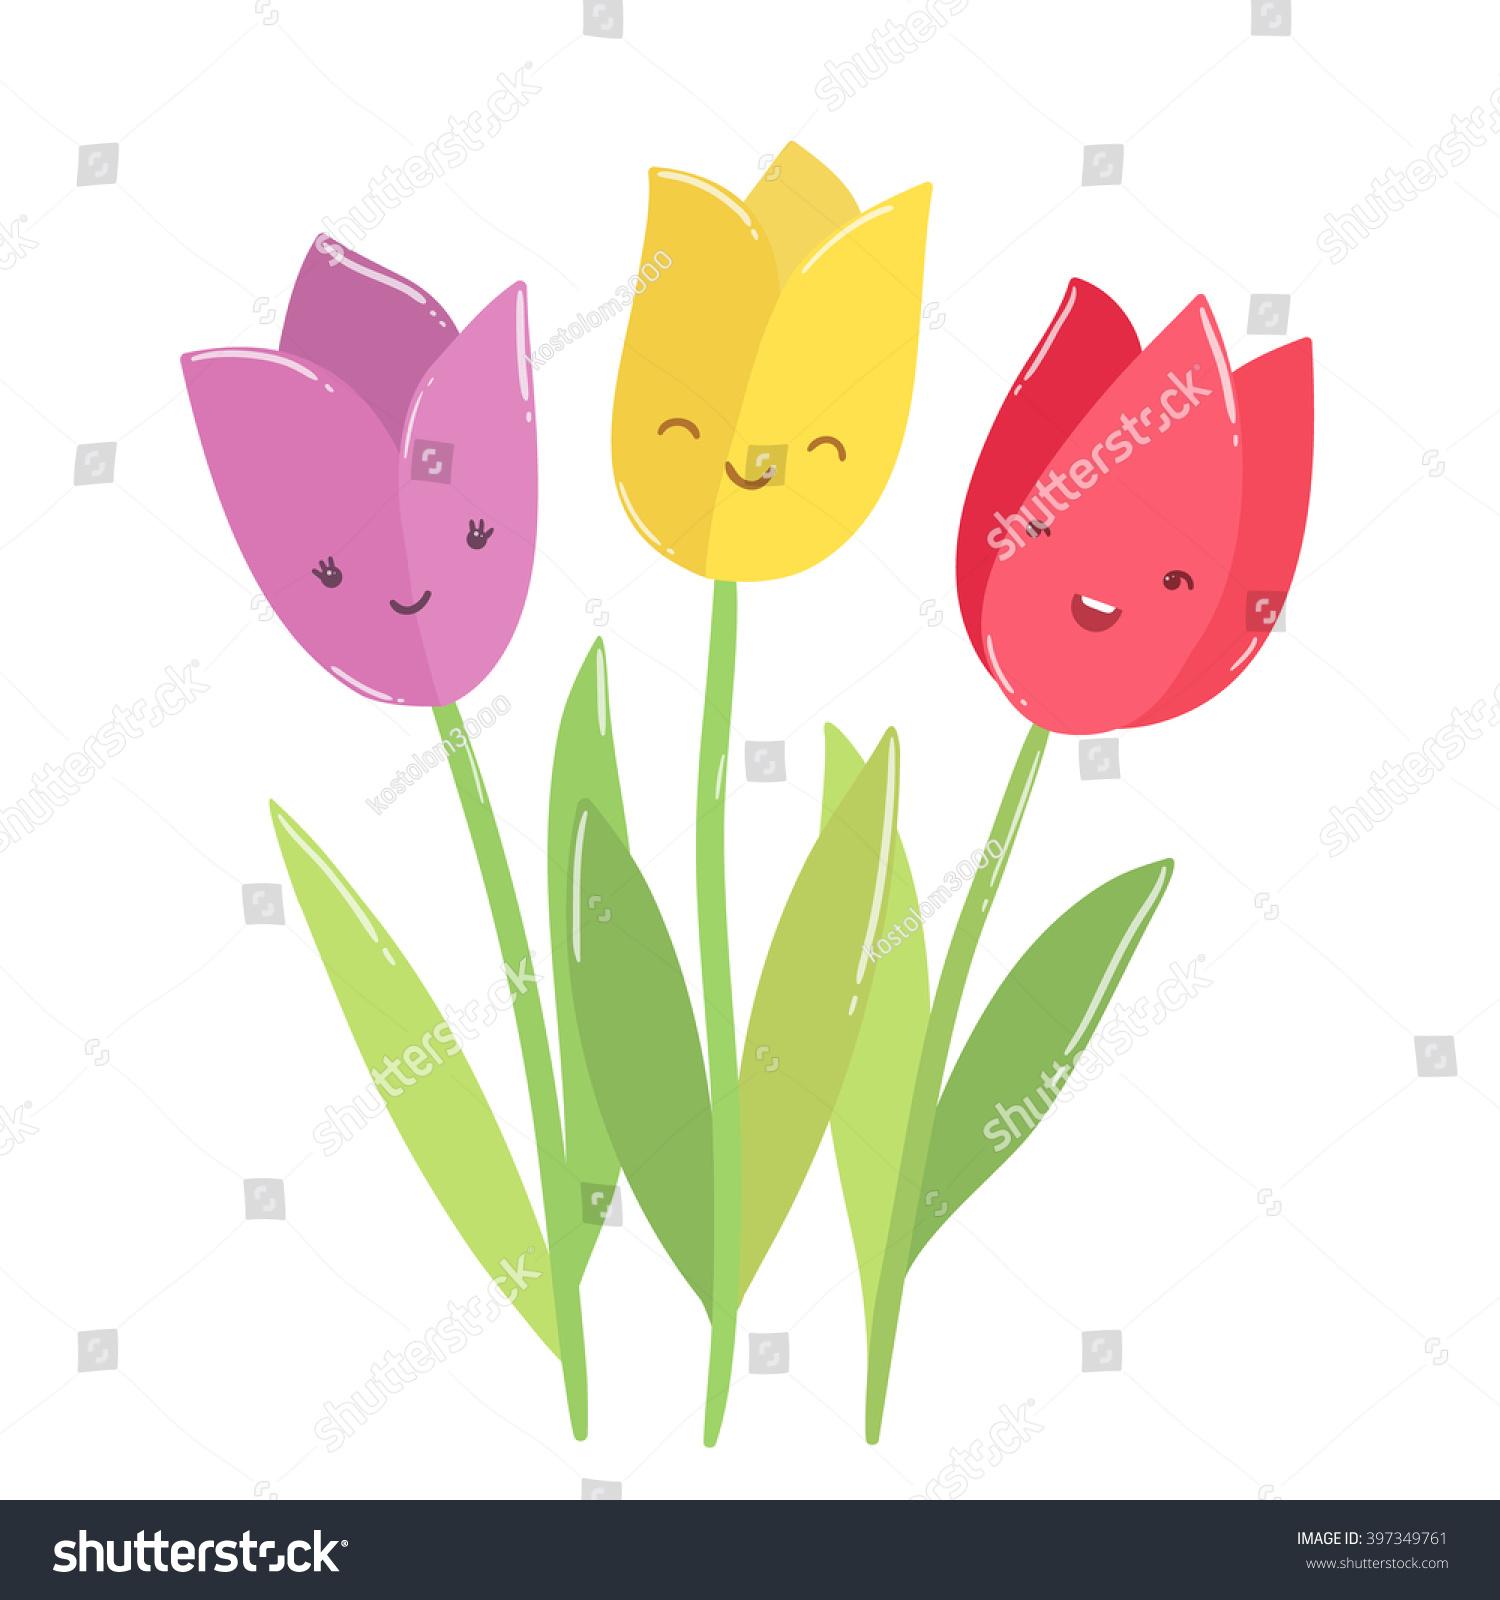 Cute funny tulips characters cartoon flower stock vector 397349761 cute funny tulips characters cartoon flower illustration izmirmasajfo